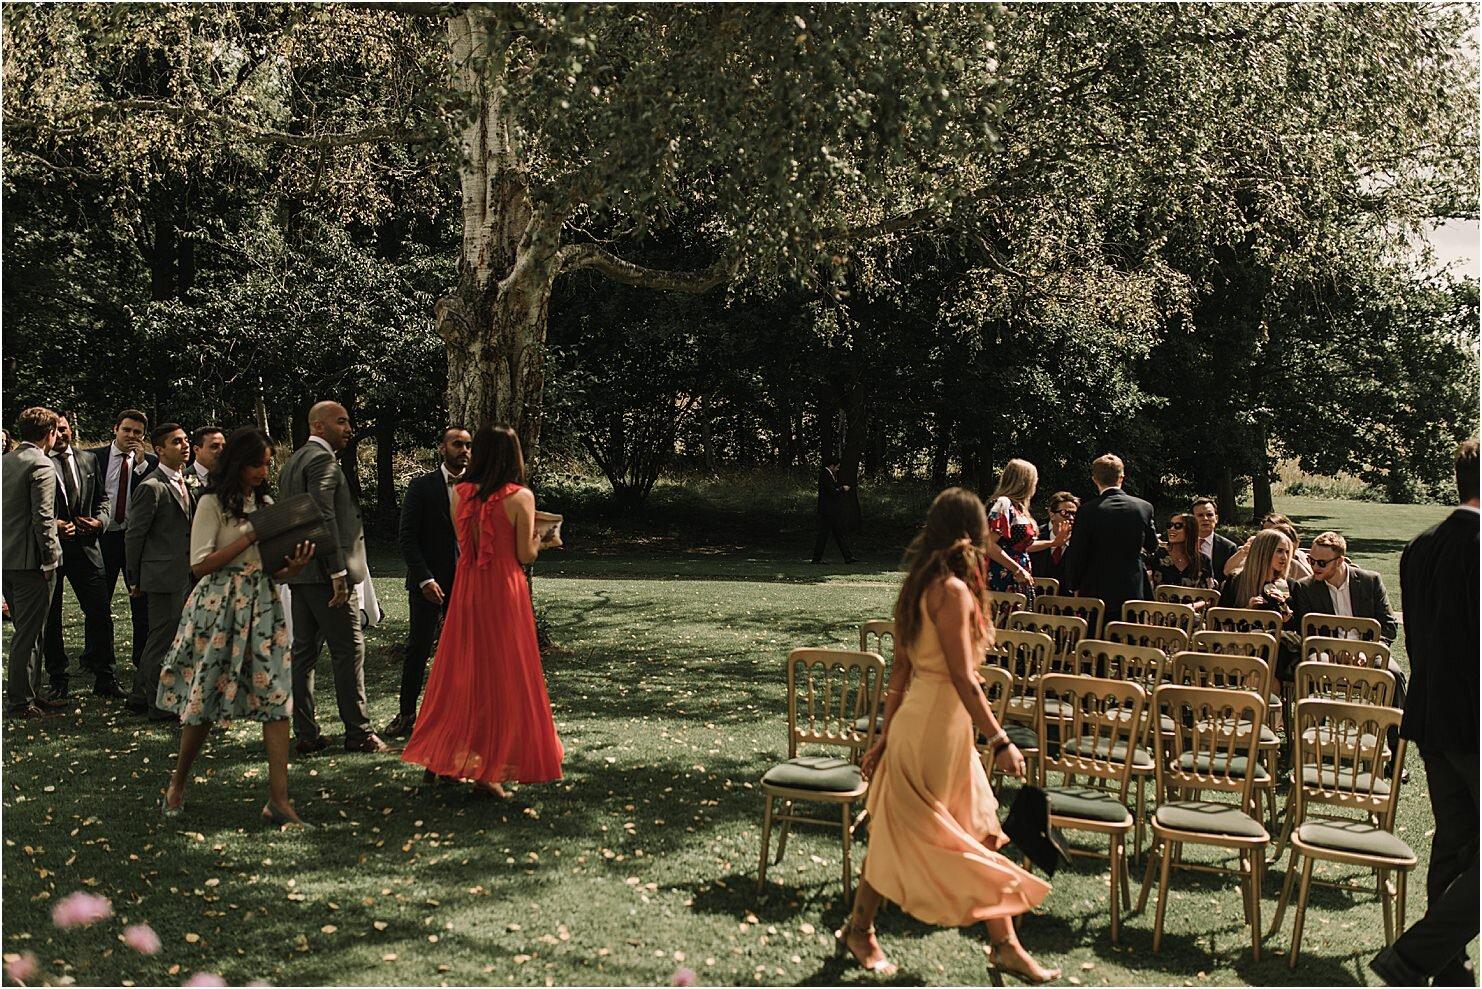 boda-de-cuento-en-castillo-boda-en-londres-40.jpg